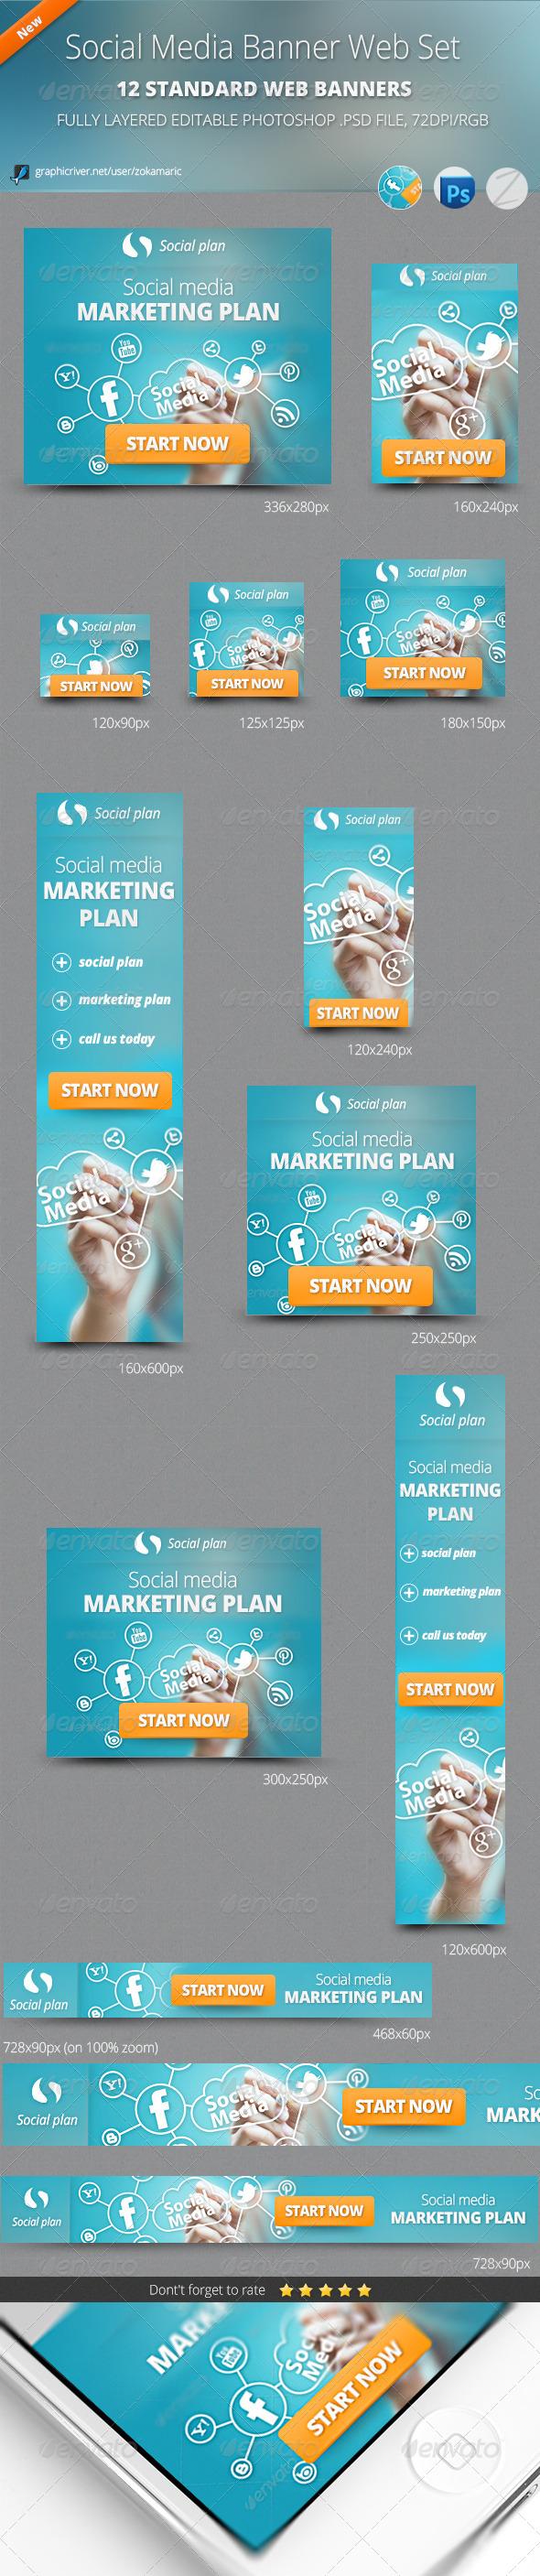 Social Media Banner Web Set - Banners & Ads Web Elements